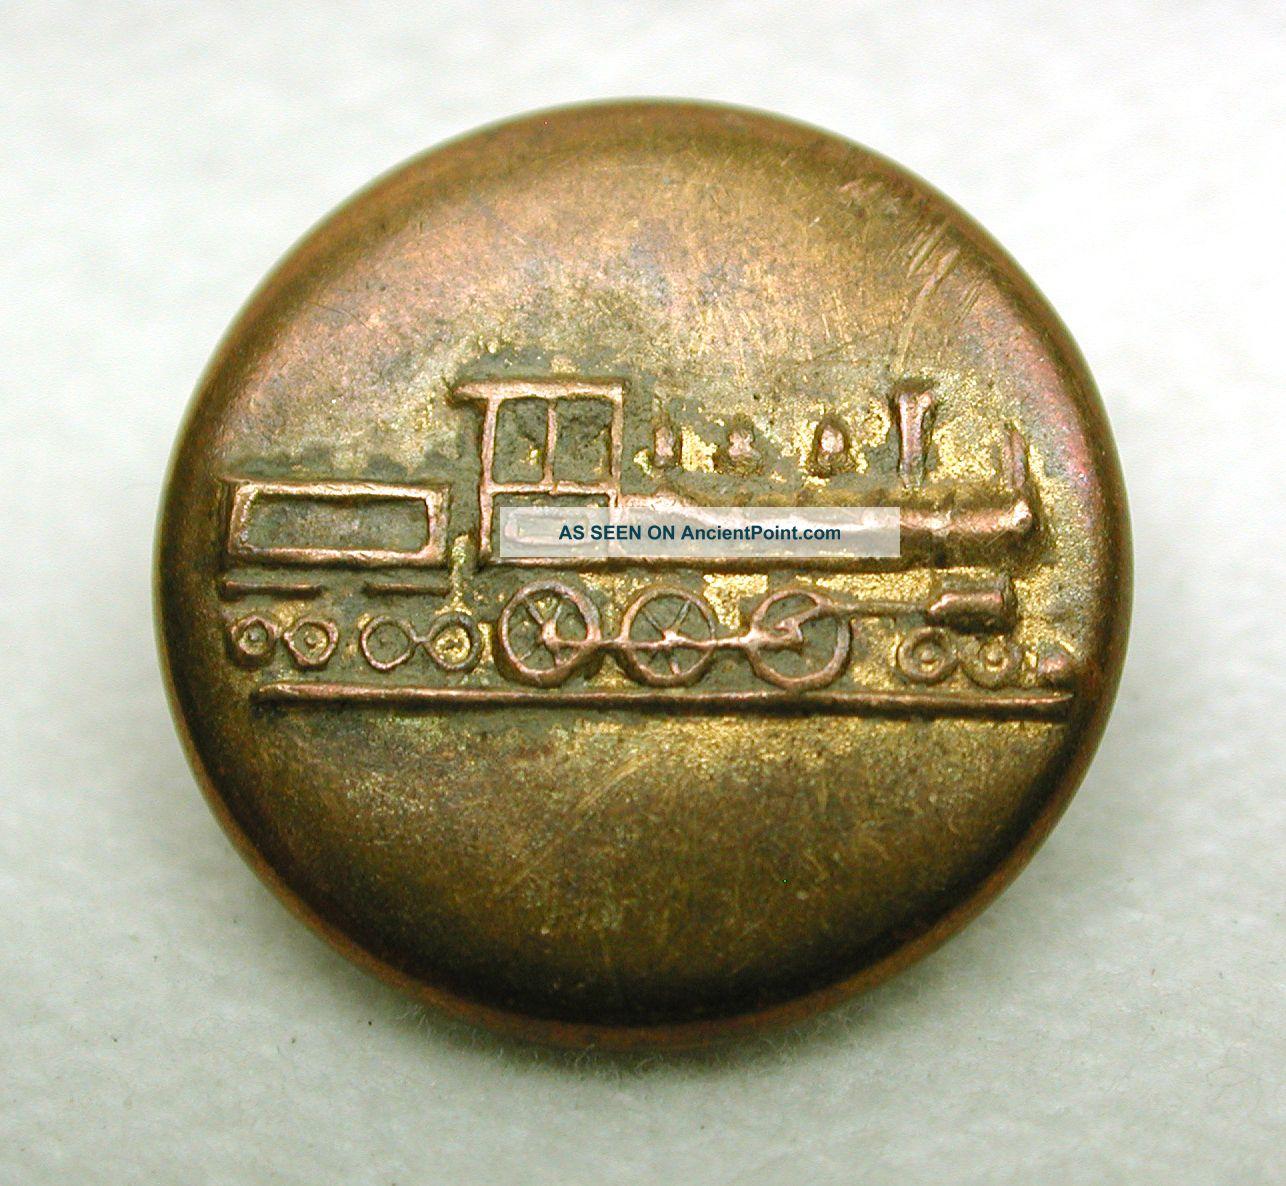 Antique Work Clothes Button Steam Locomotive Engine Design Buttons photo